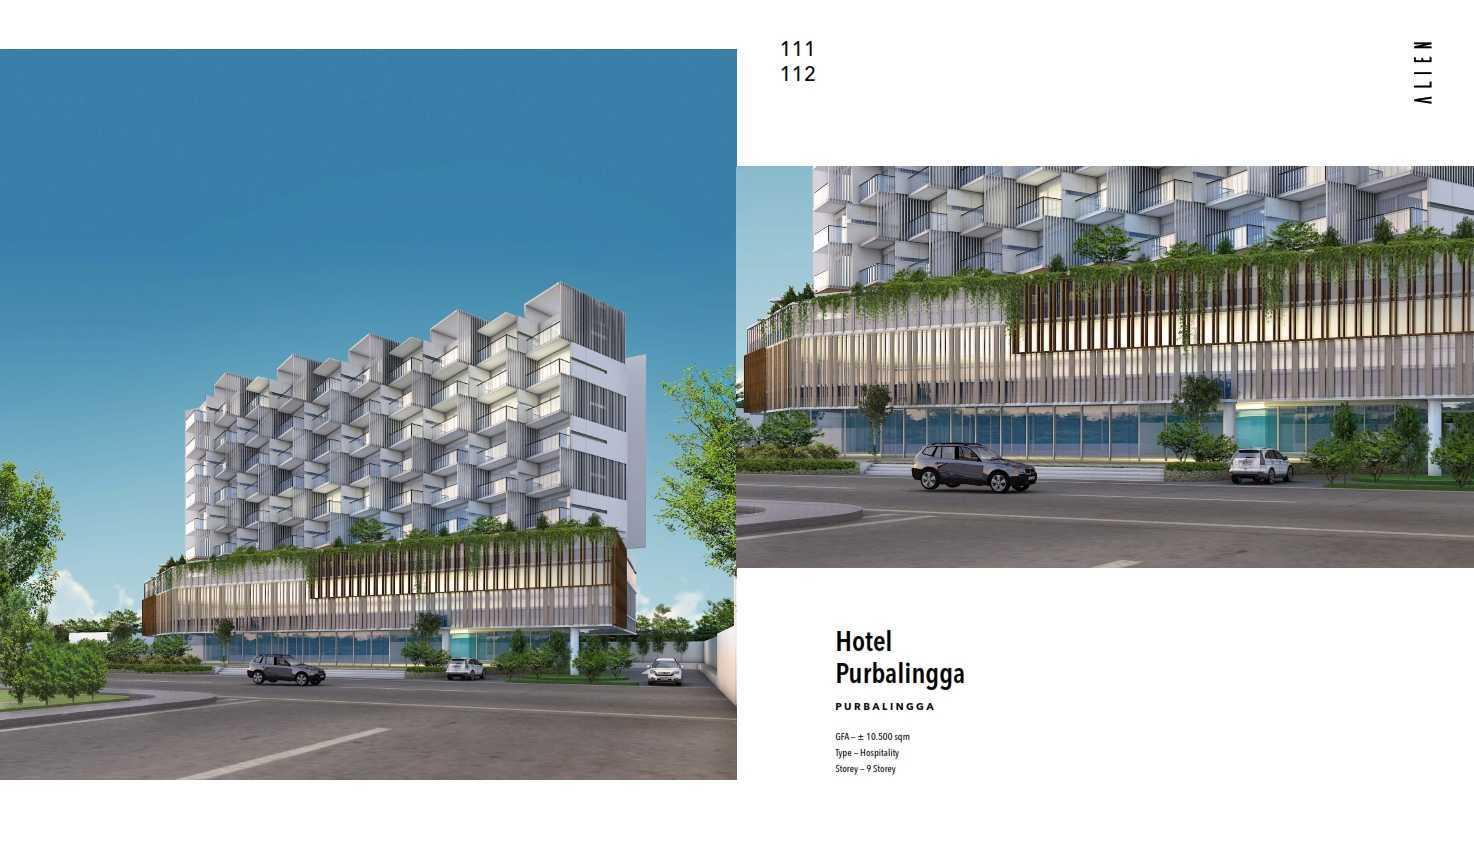 Alien Design Consultant Alien Dc Hotels & Resort Porto Palembang Palembang Aliencompro260Mmx300Mm12Updated056   44724